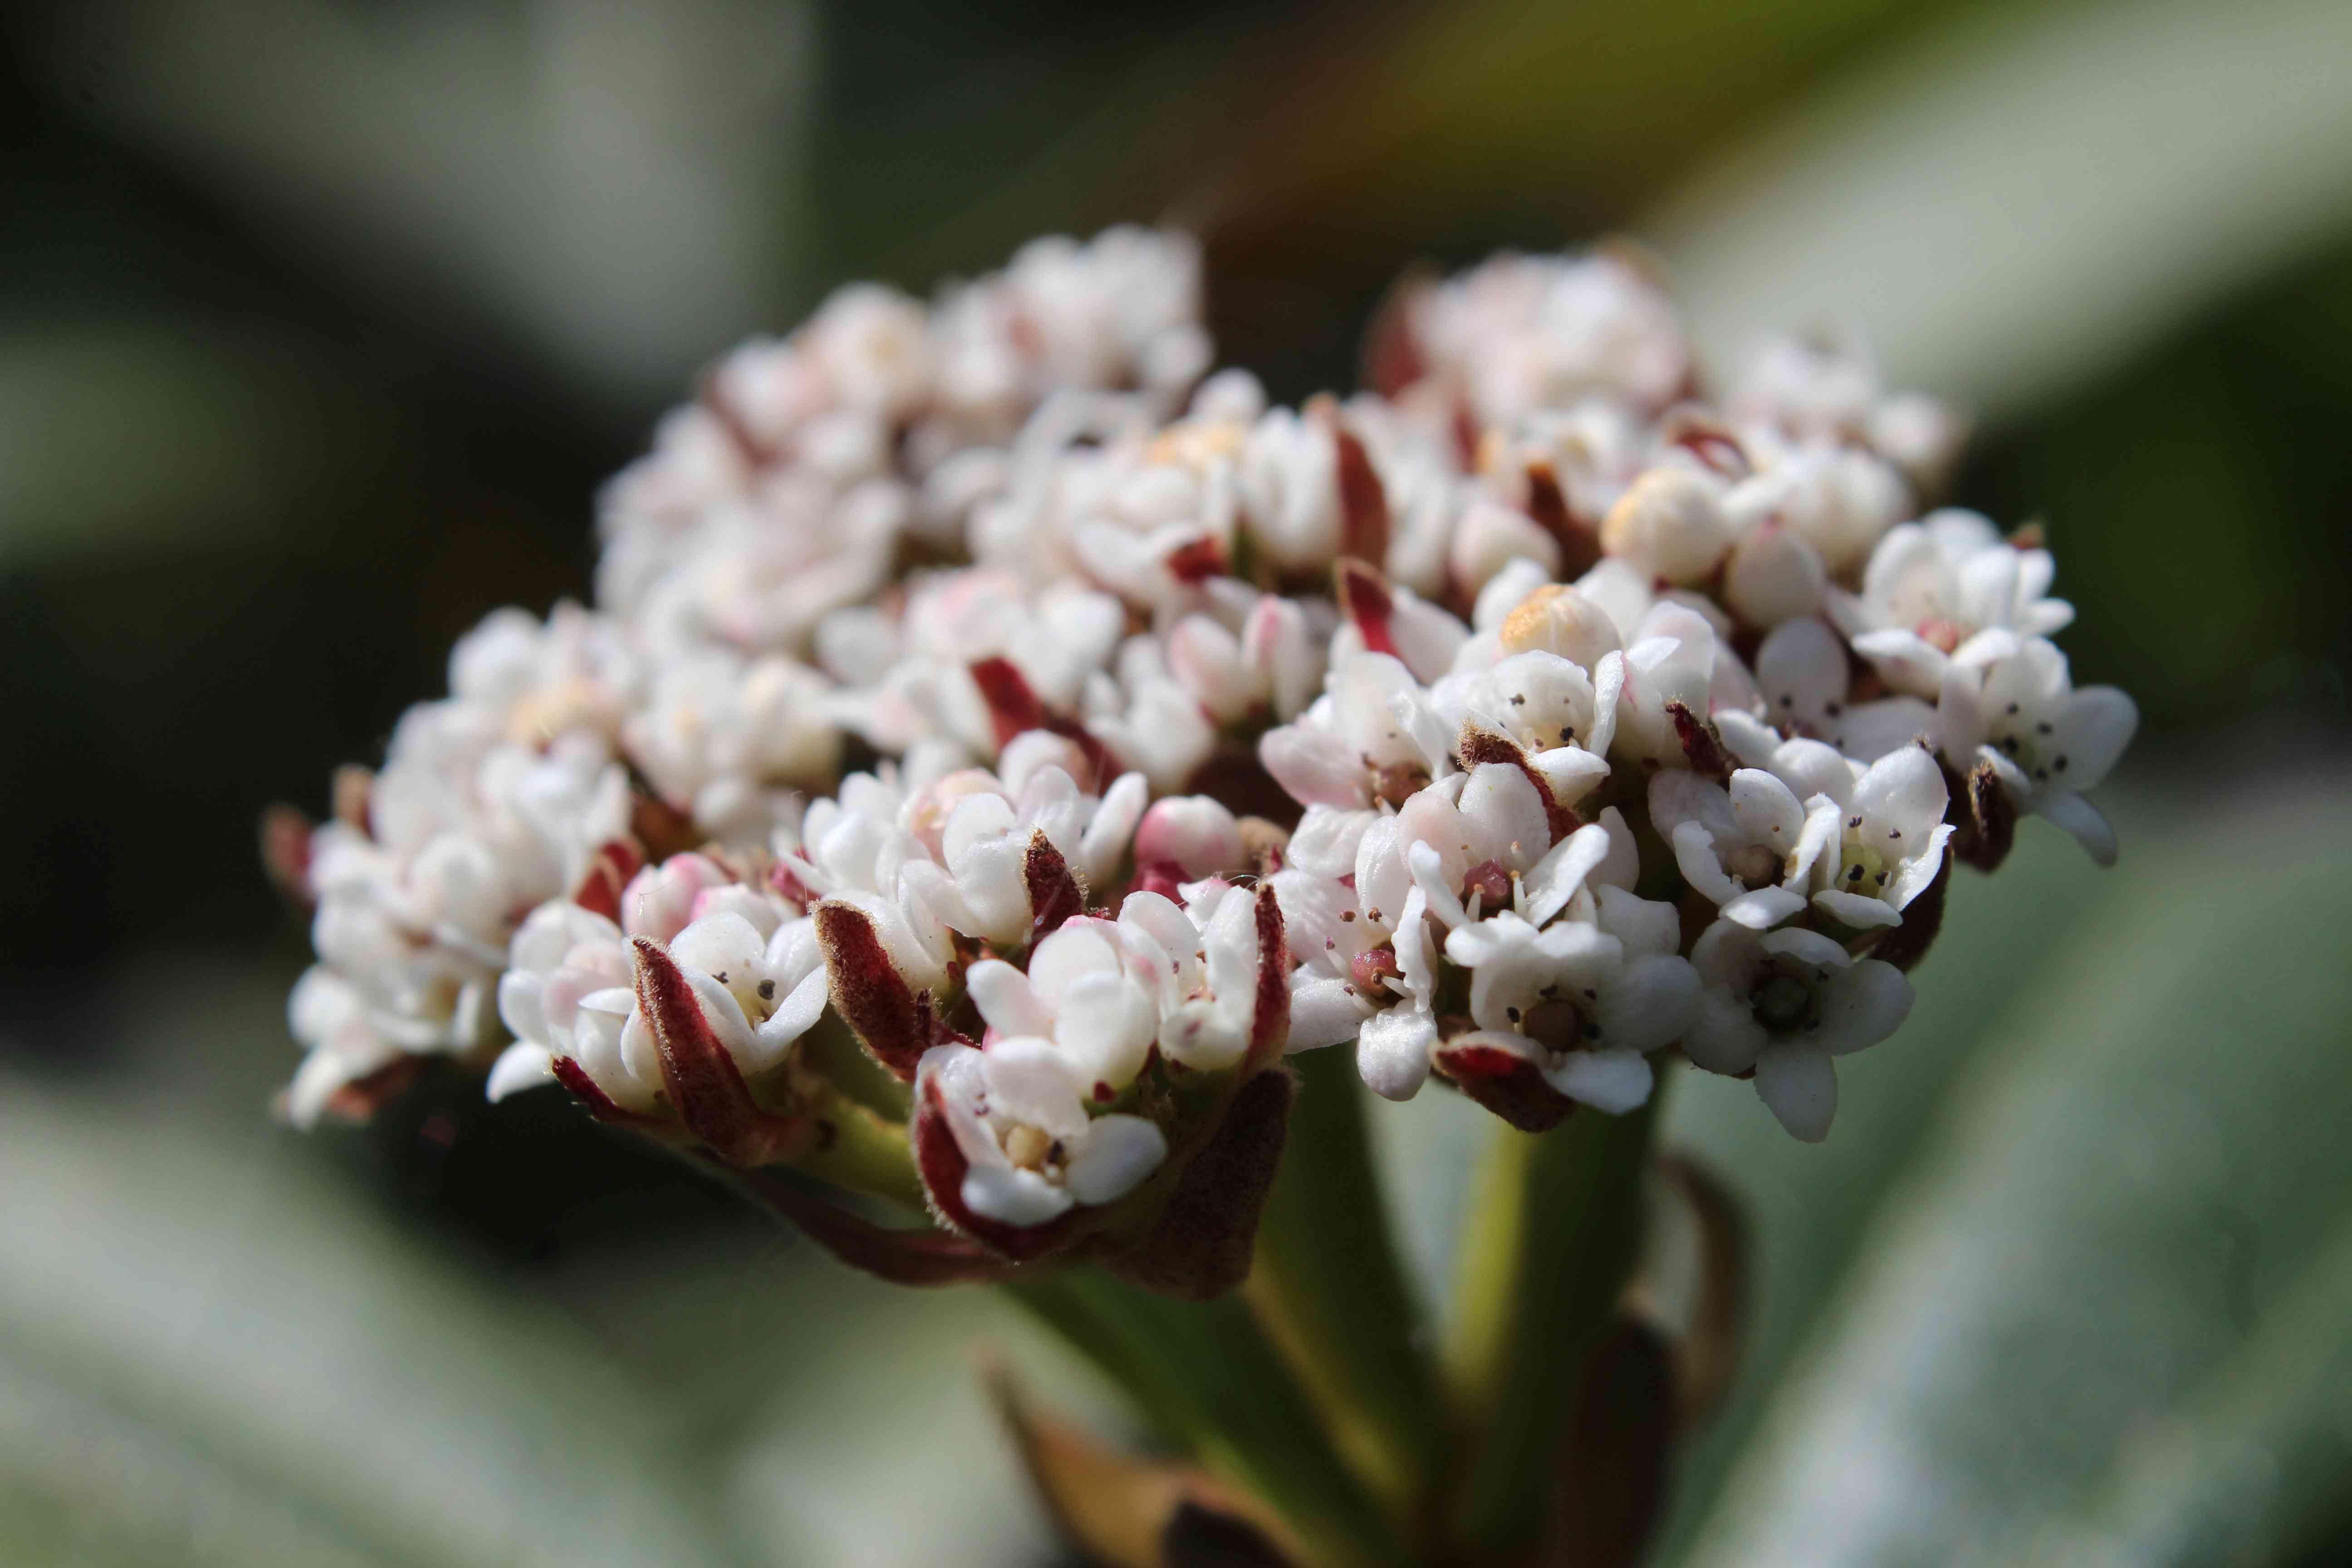 Viburnum davidii flowers, extreme close up